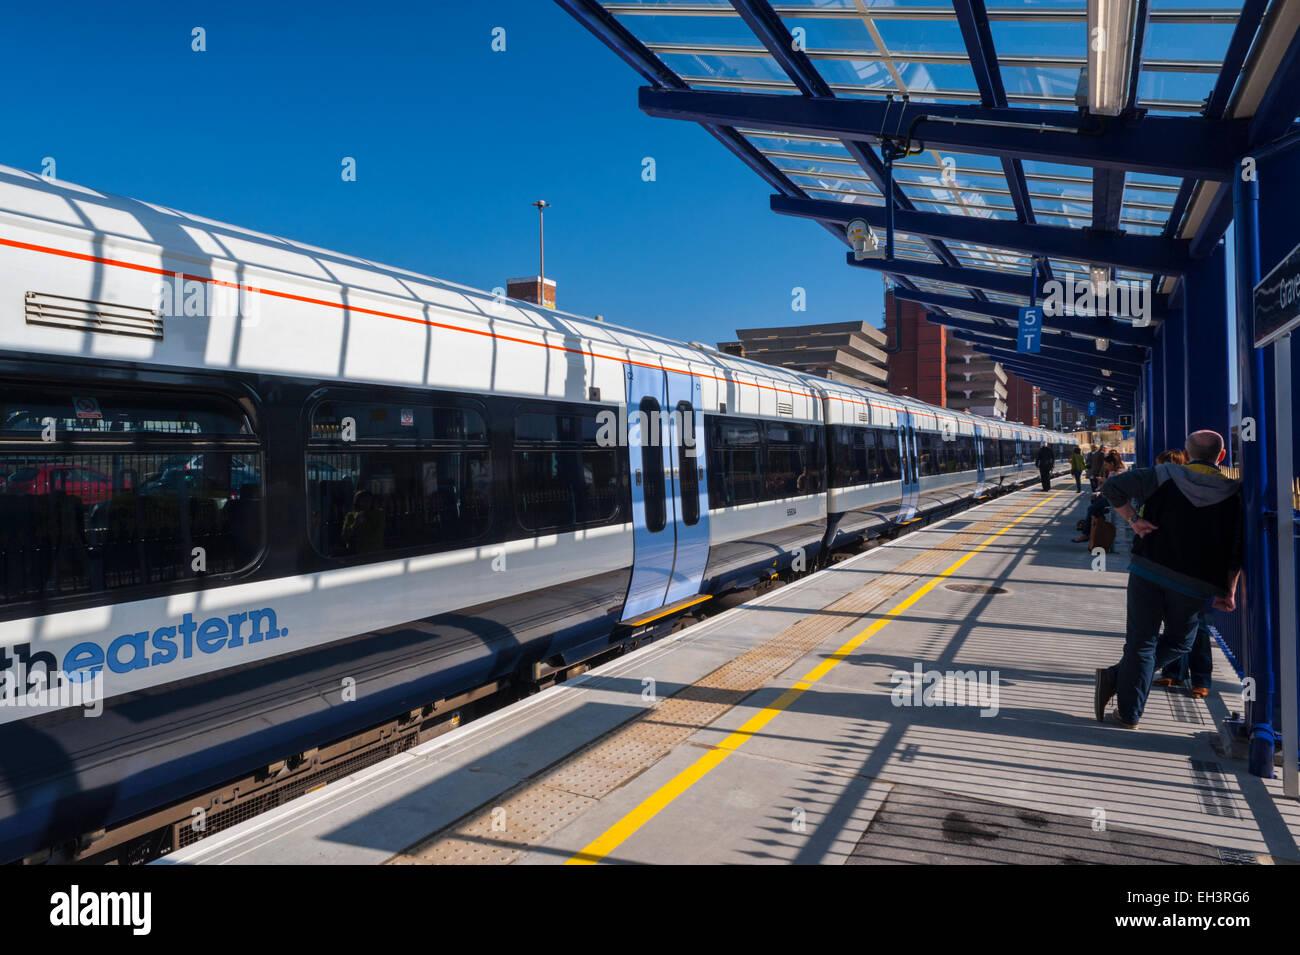 TRain at Platform 0ne 1 of tye of the new layout of gravesend station - Stock Image